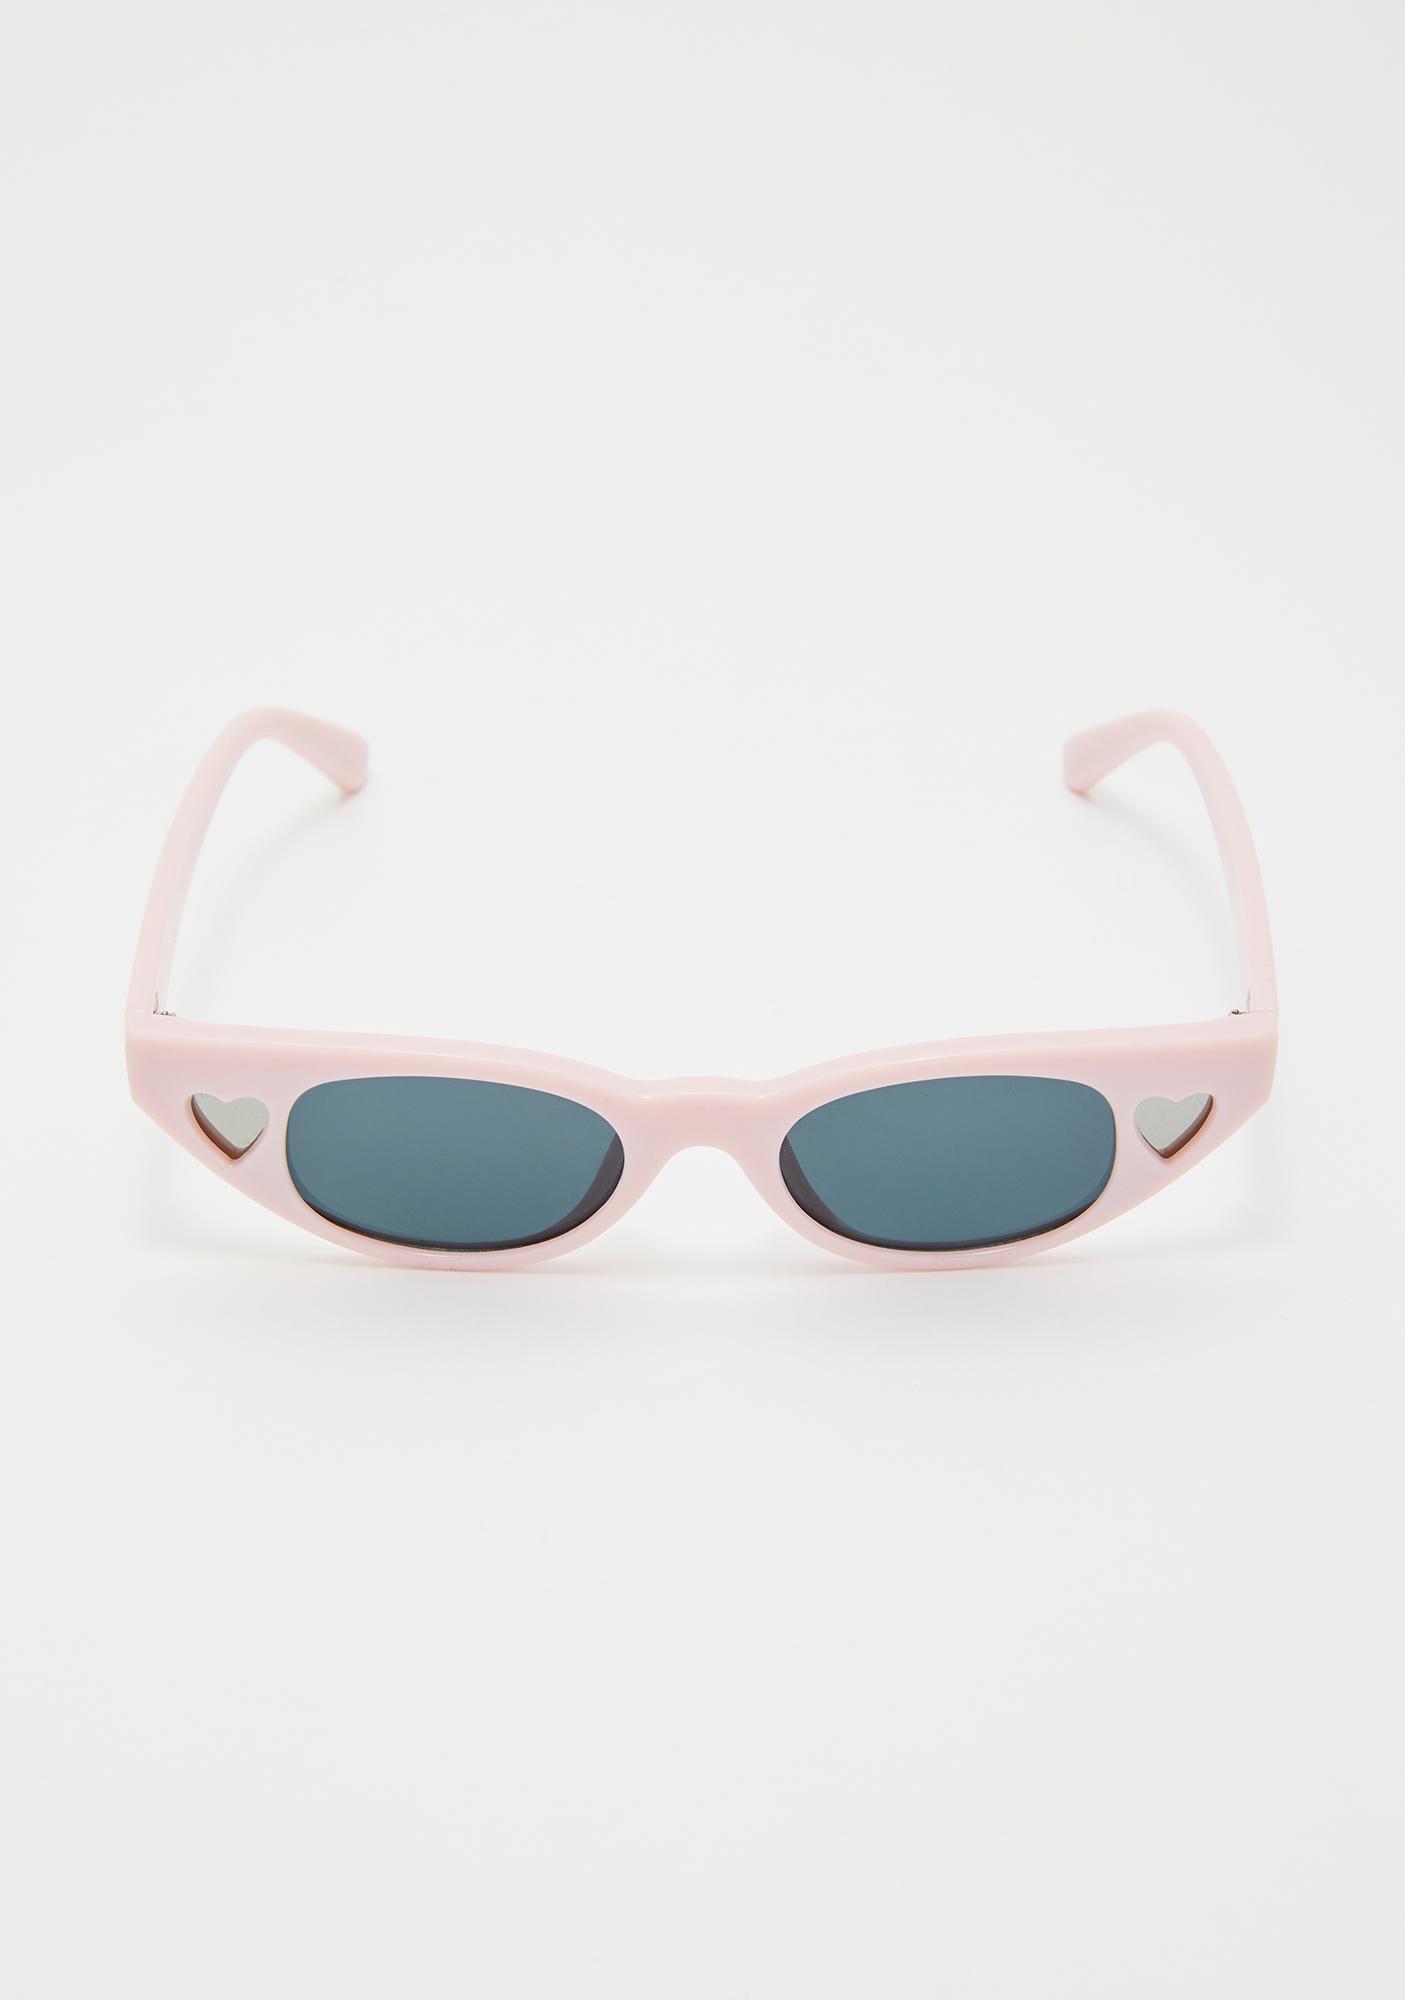 Luv Vision Tiny Sunglasses